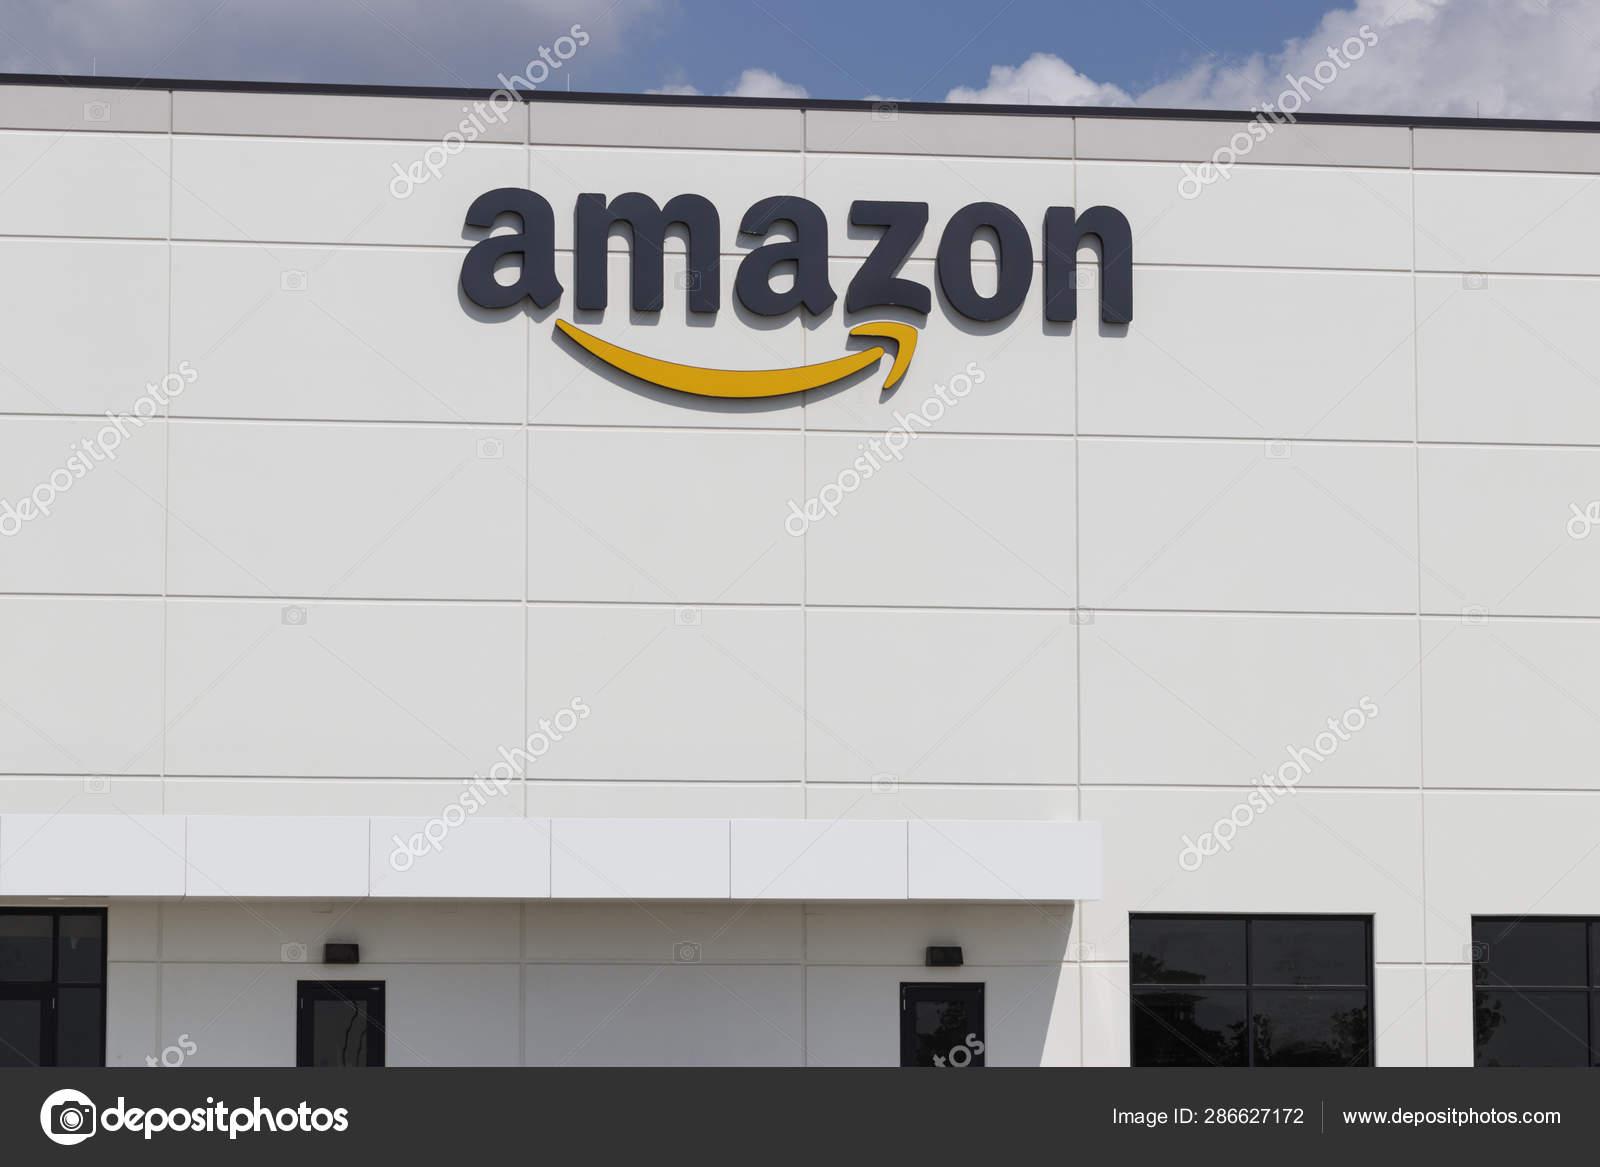 Greenwood - Circa July 2019: Amazon Receiving Center  Amazon